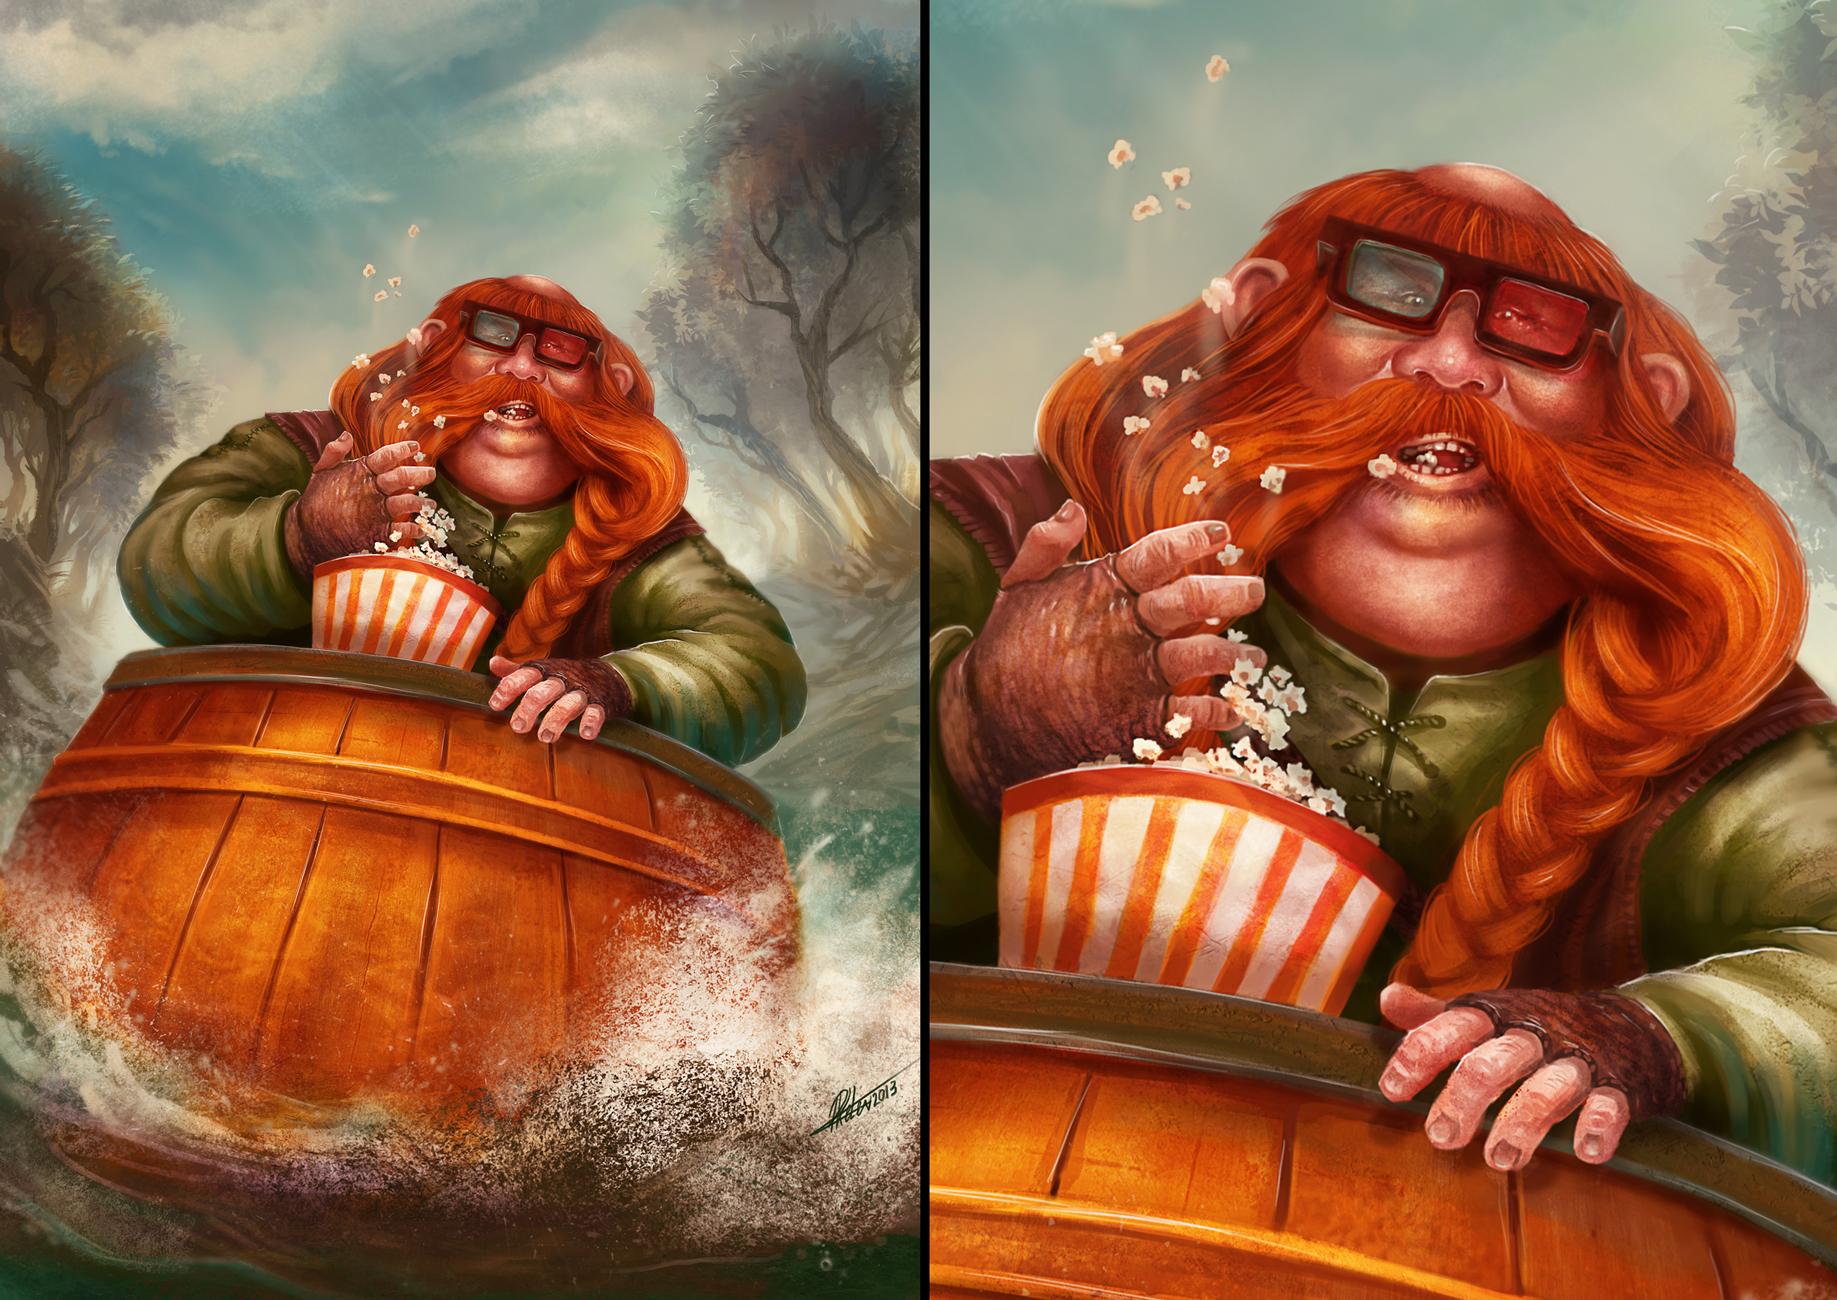 Fanart of Bombur - Hobbit by ARTdesk